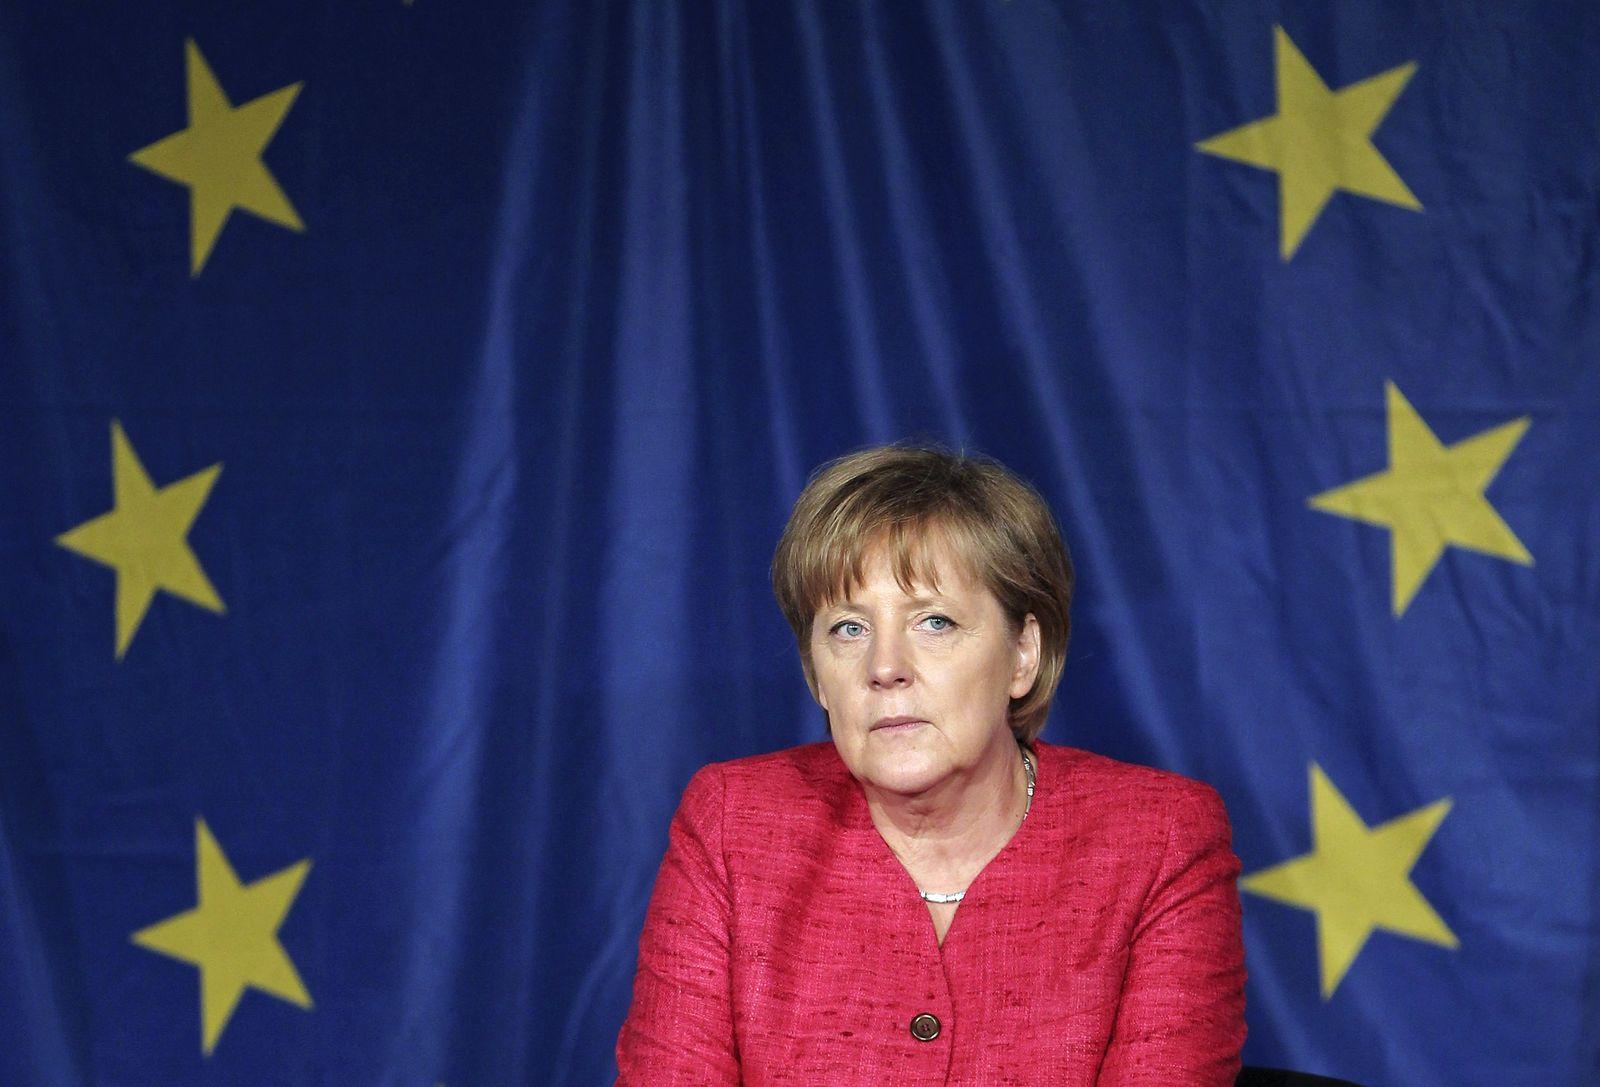 Angela Merkel / Europa XXL